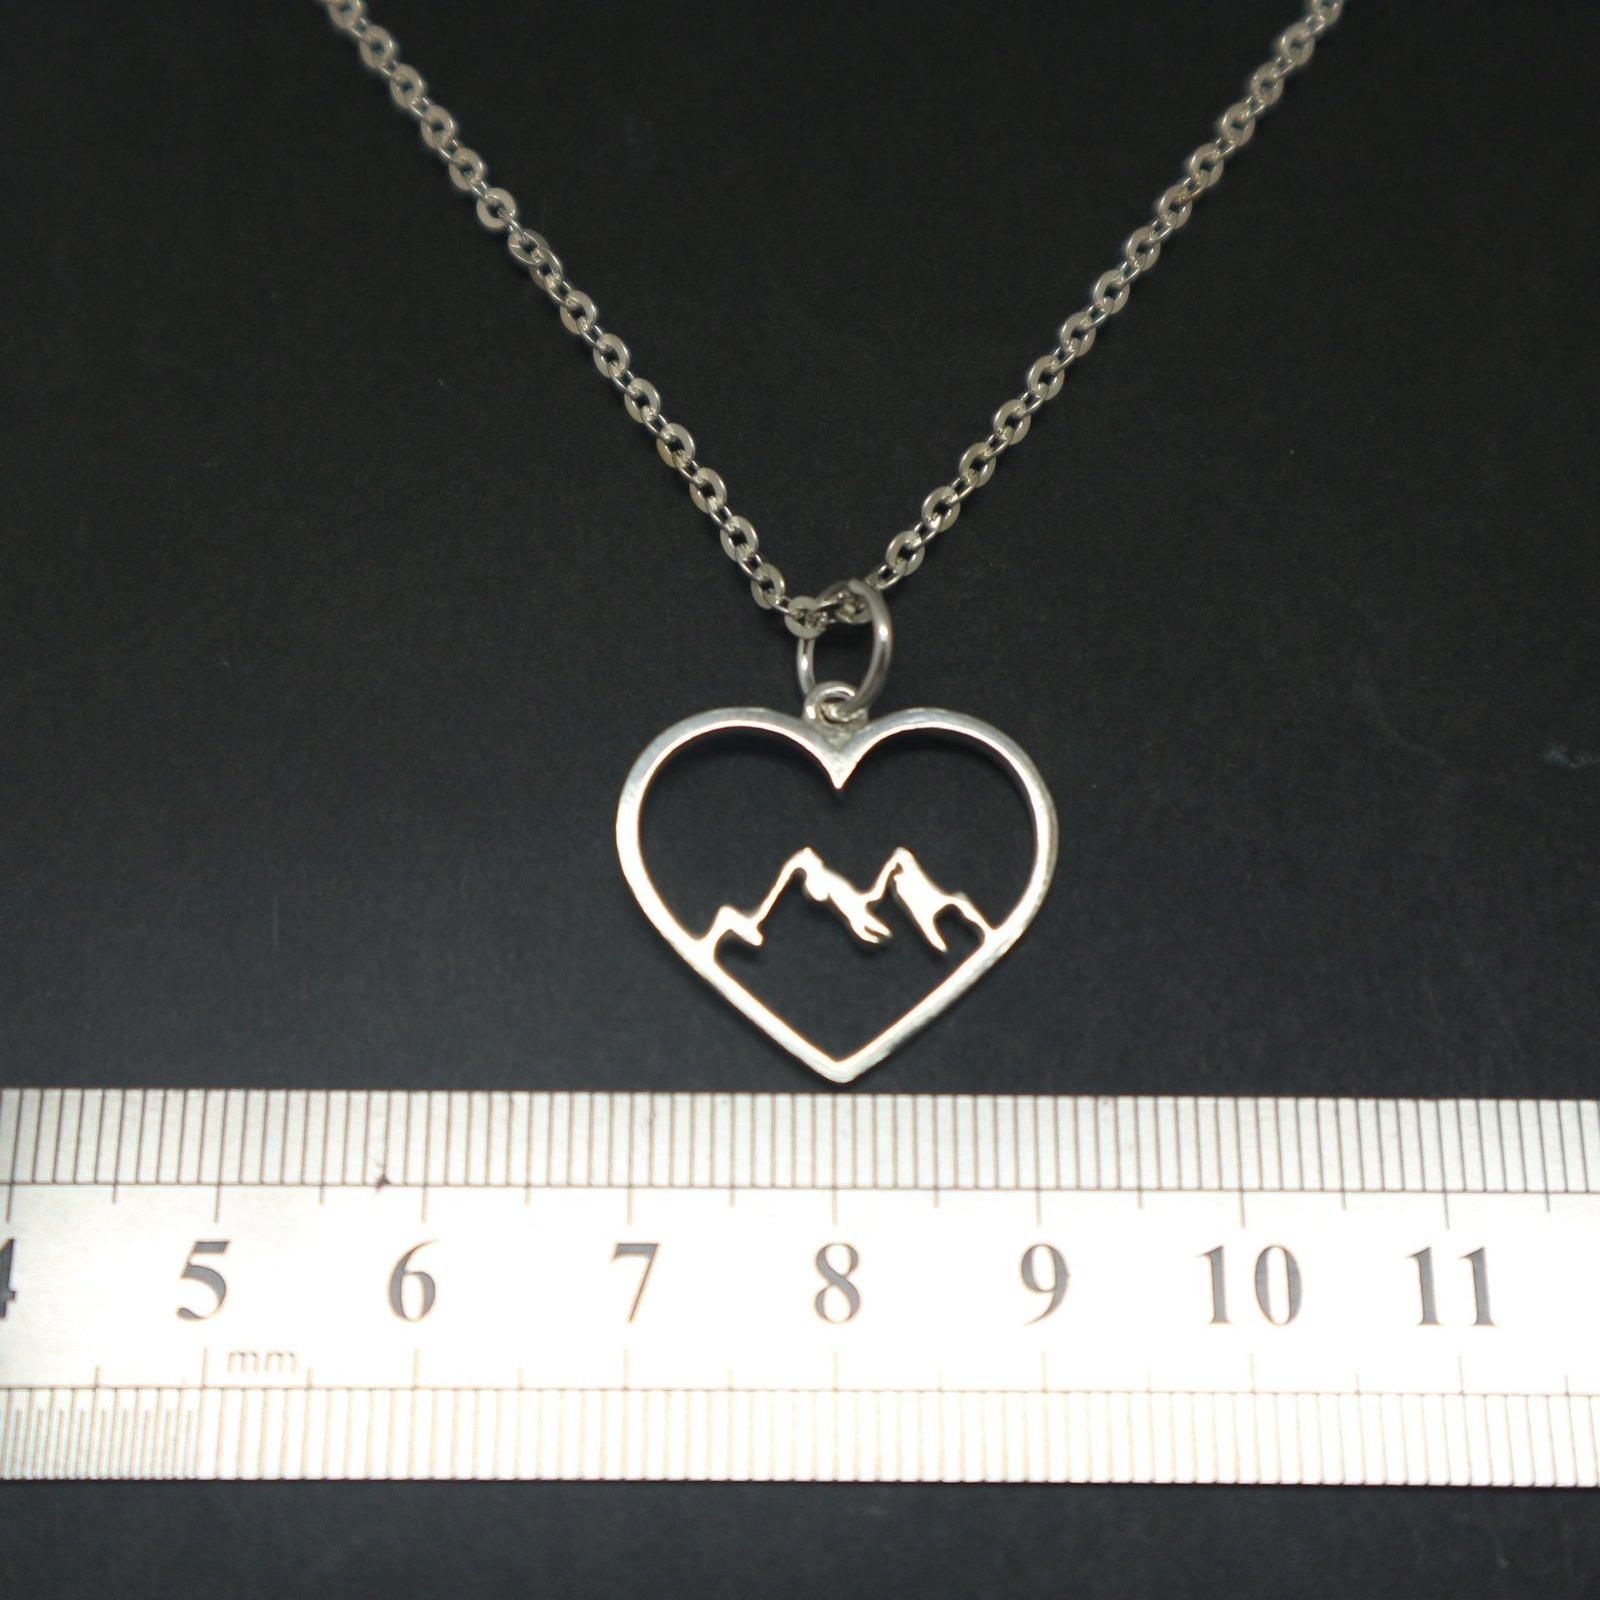 Mountain Range Heart Necklace Pendant image 4